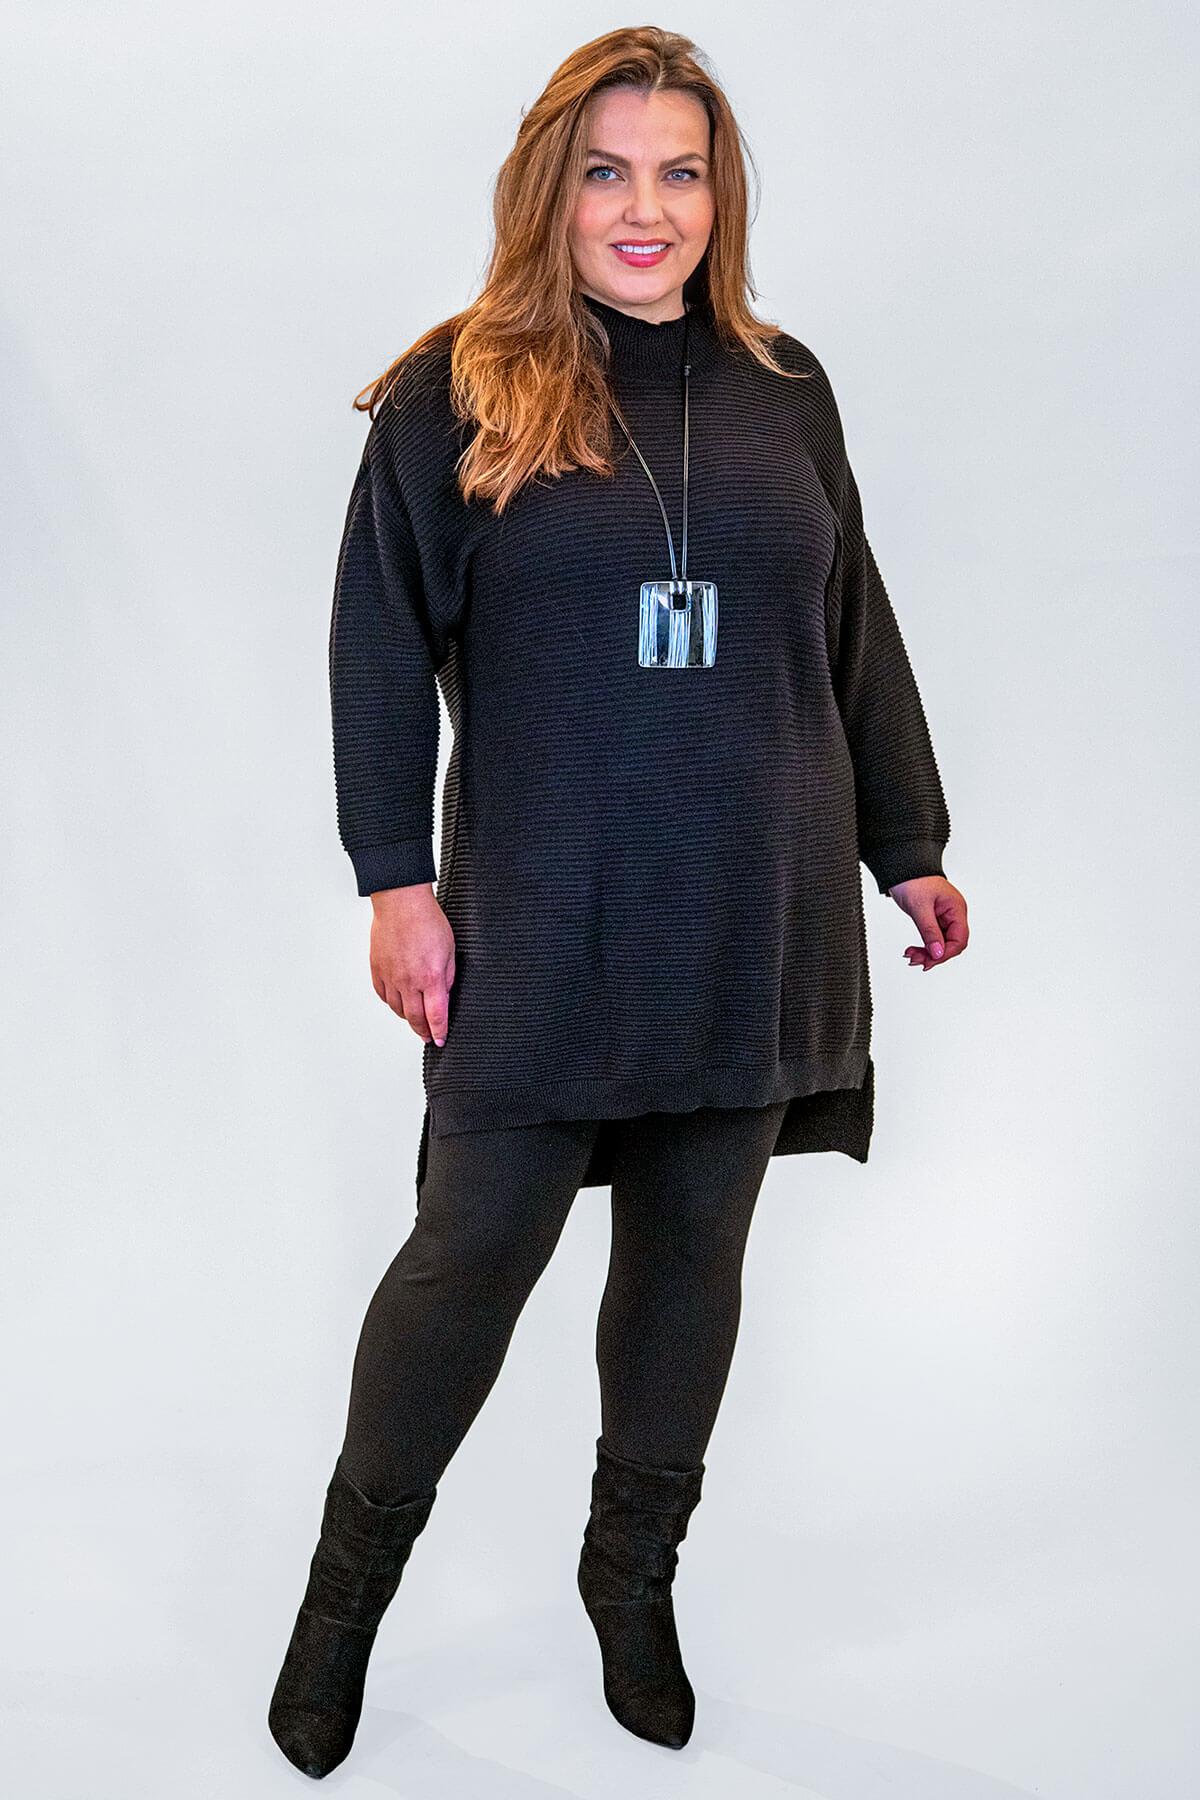 Orientique jumper dress